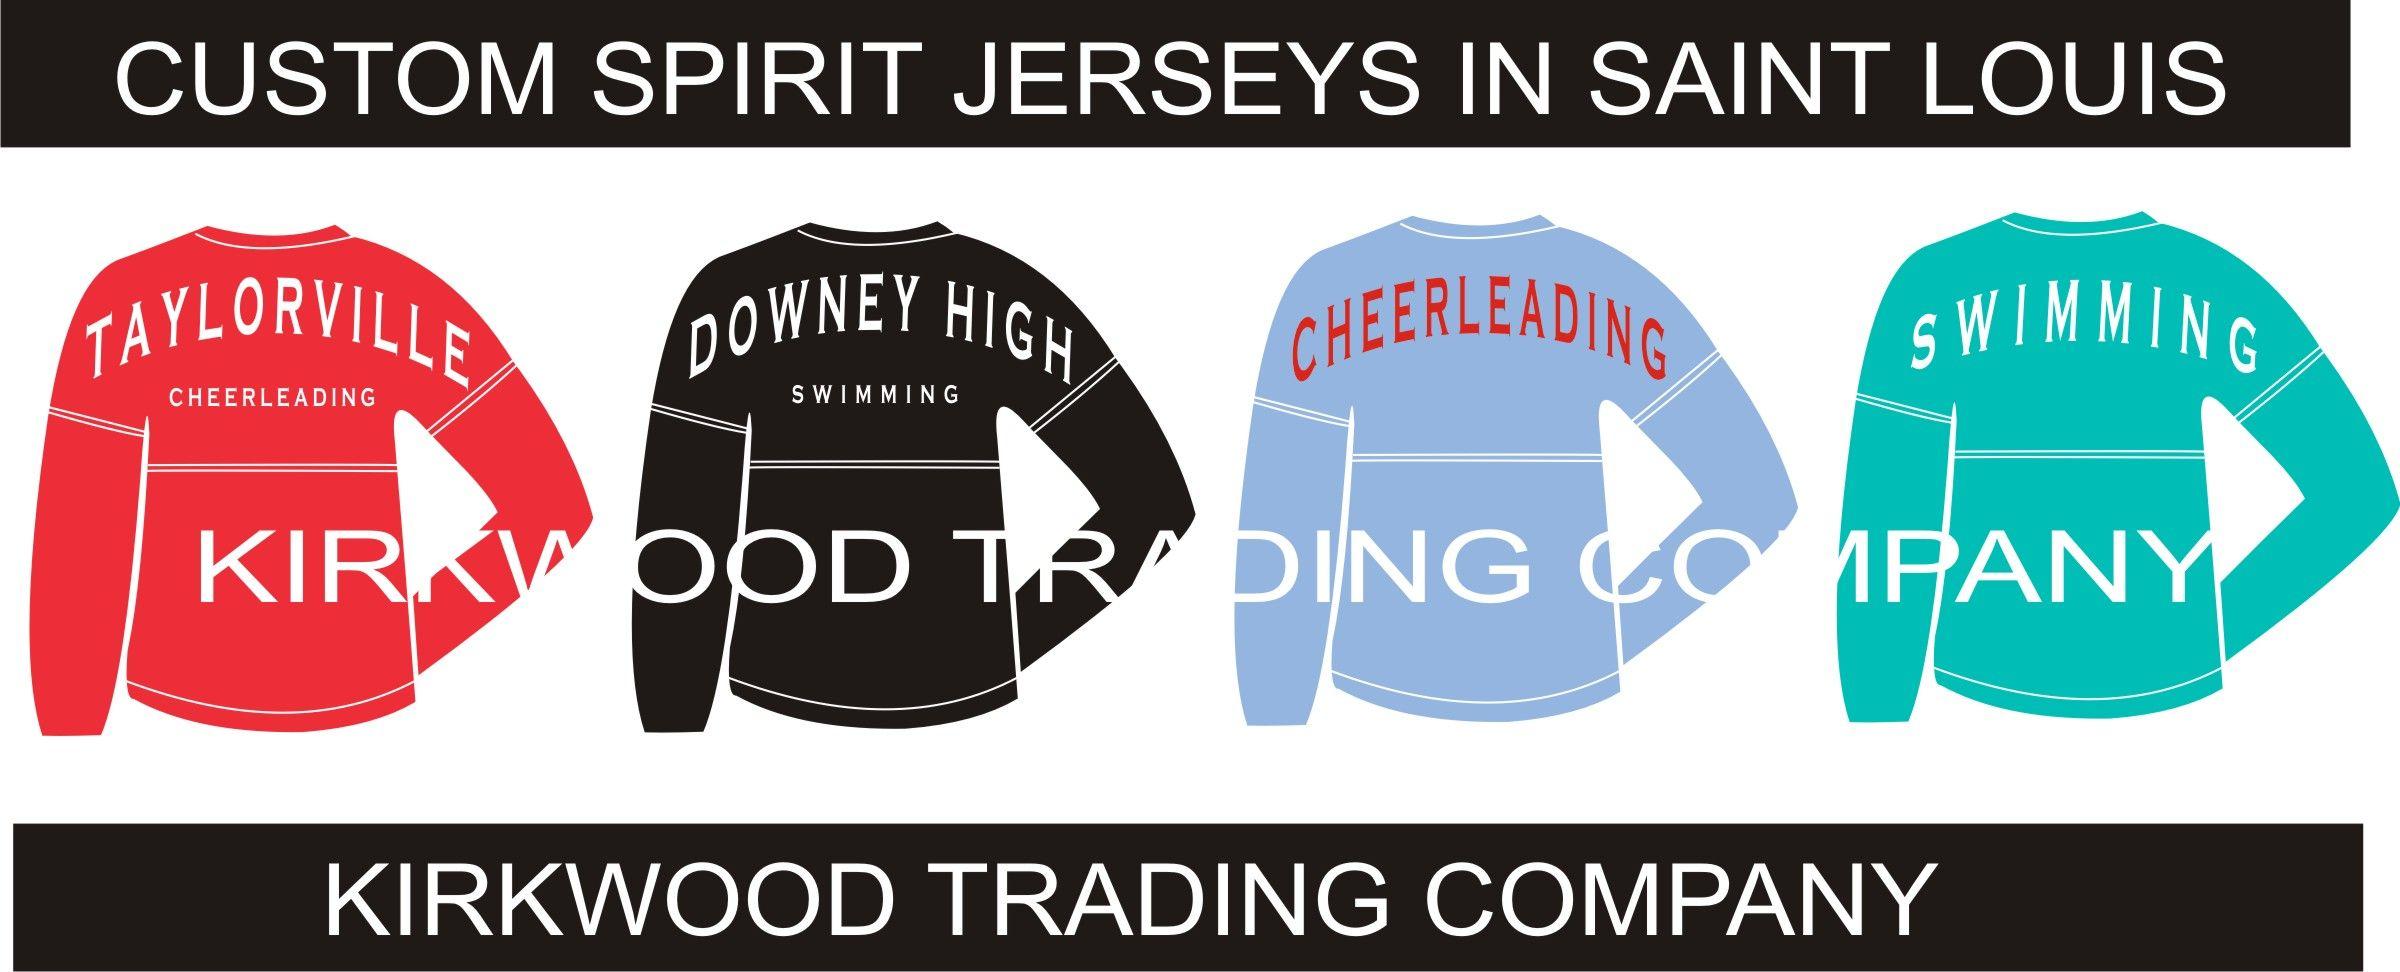 Custom Printed Spirit Jerseys In Saint Louis Custom T Shirts Fast